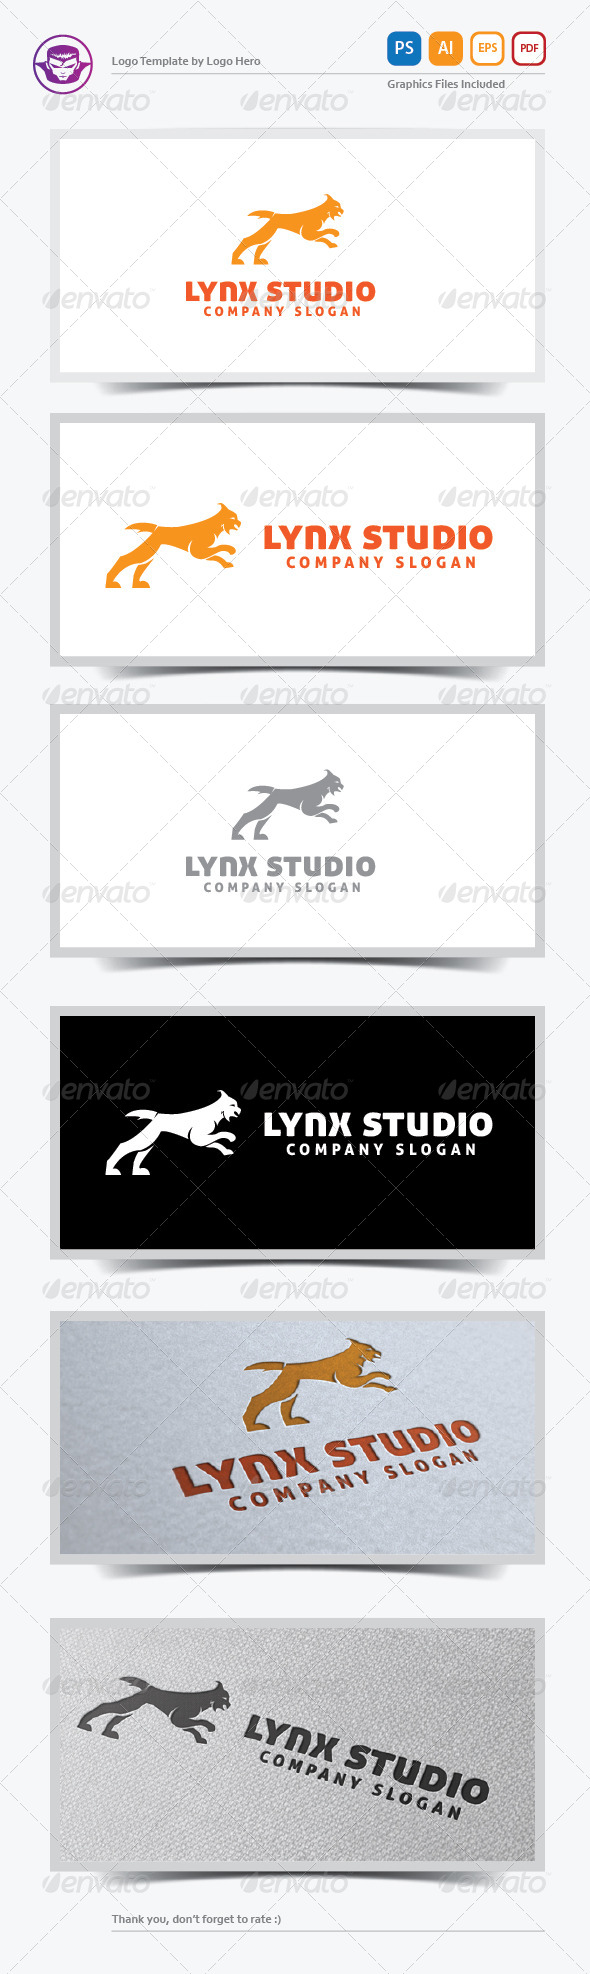 Lynx Studio Logo Template